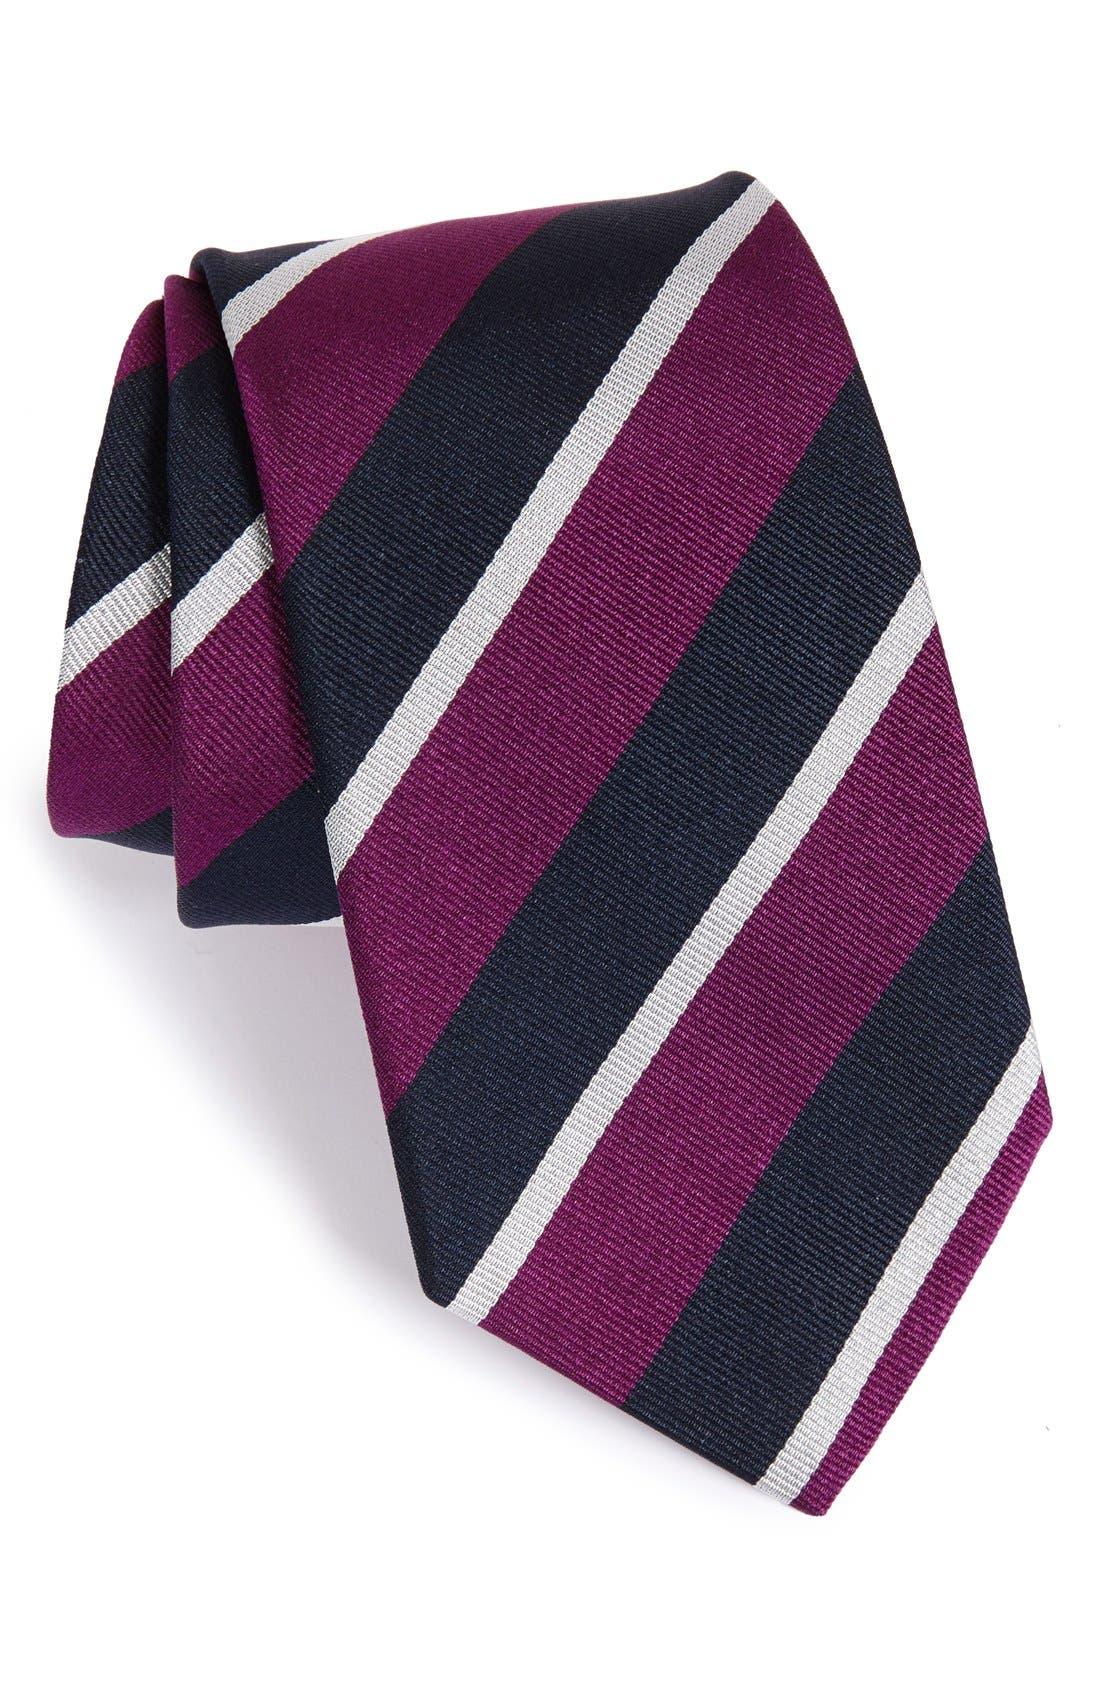 GITMAN, Stripe Silk Tie, Main thumbnail 1, color, PURPLE